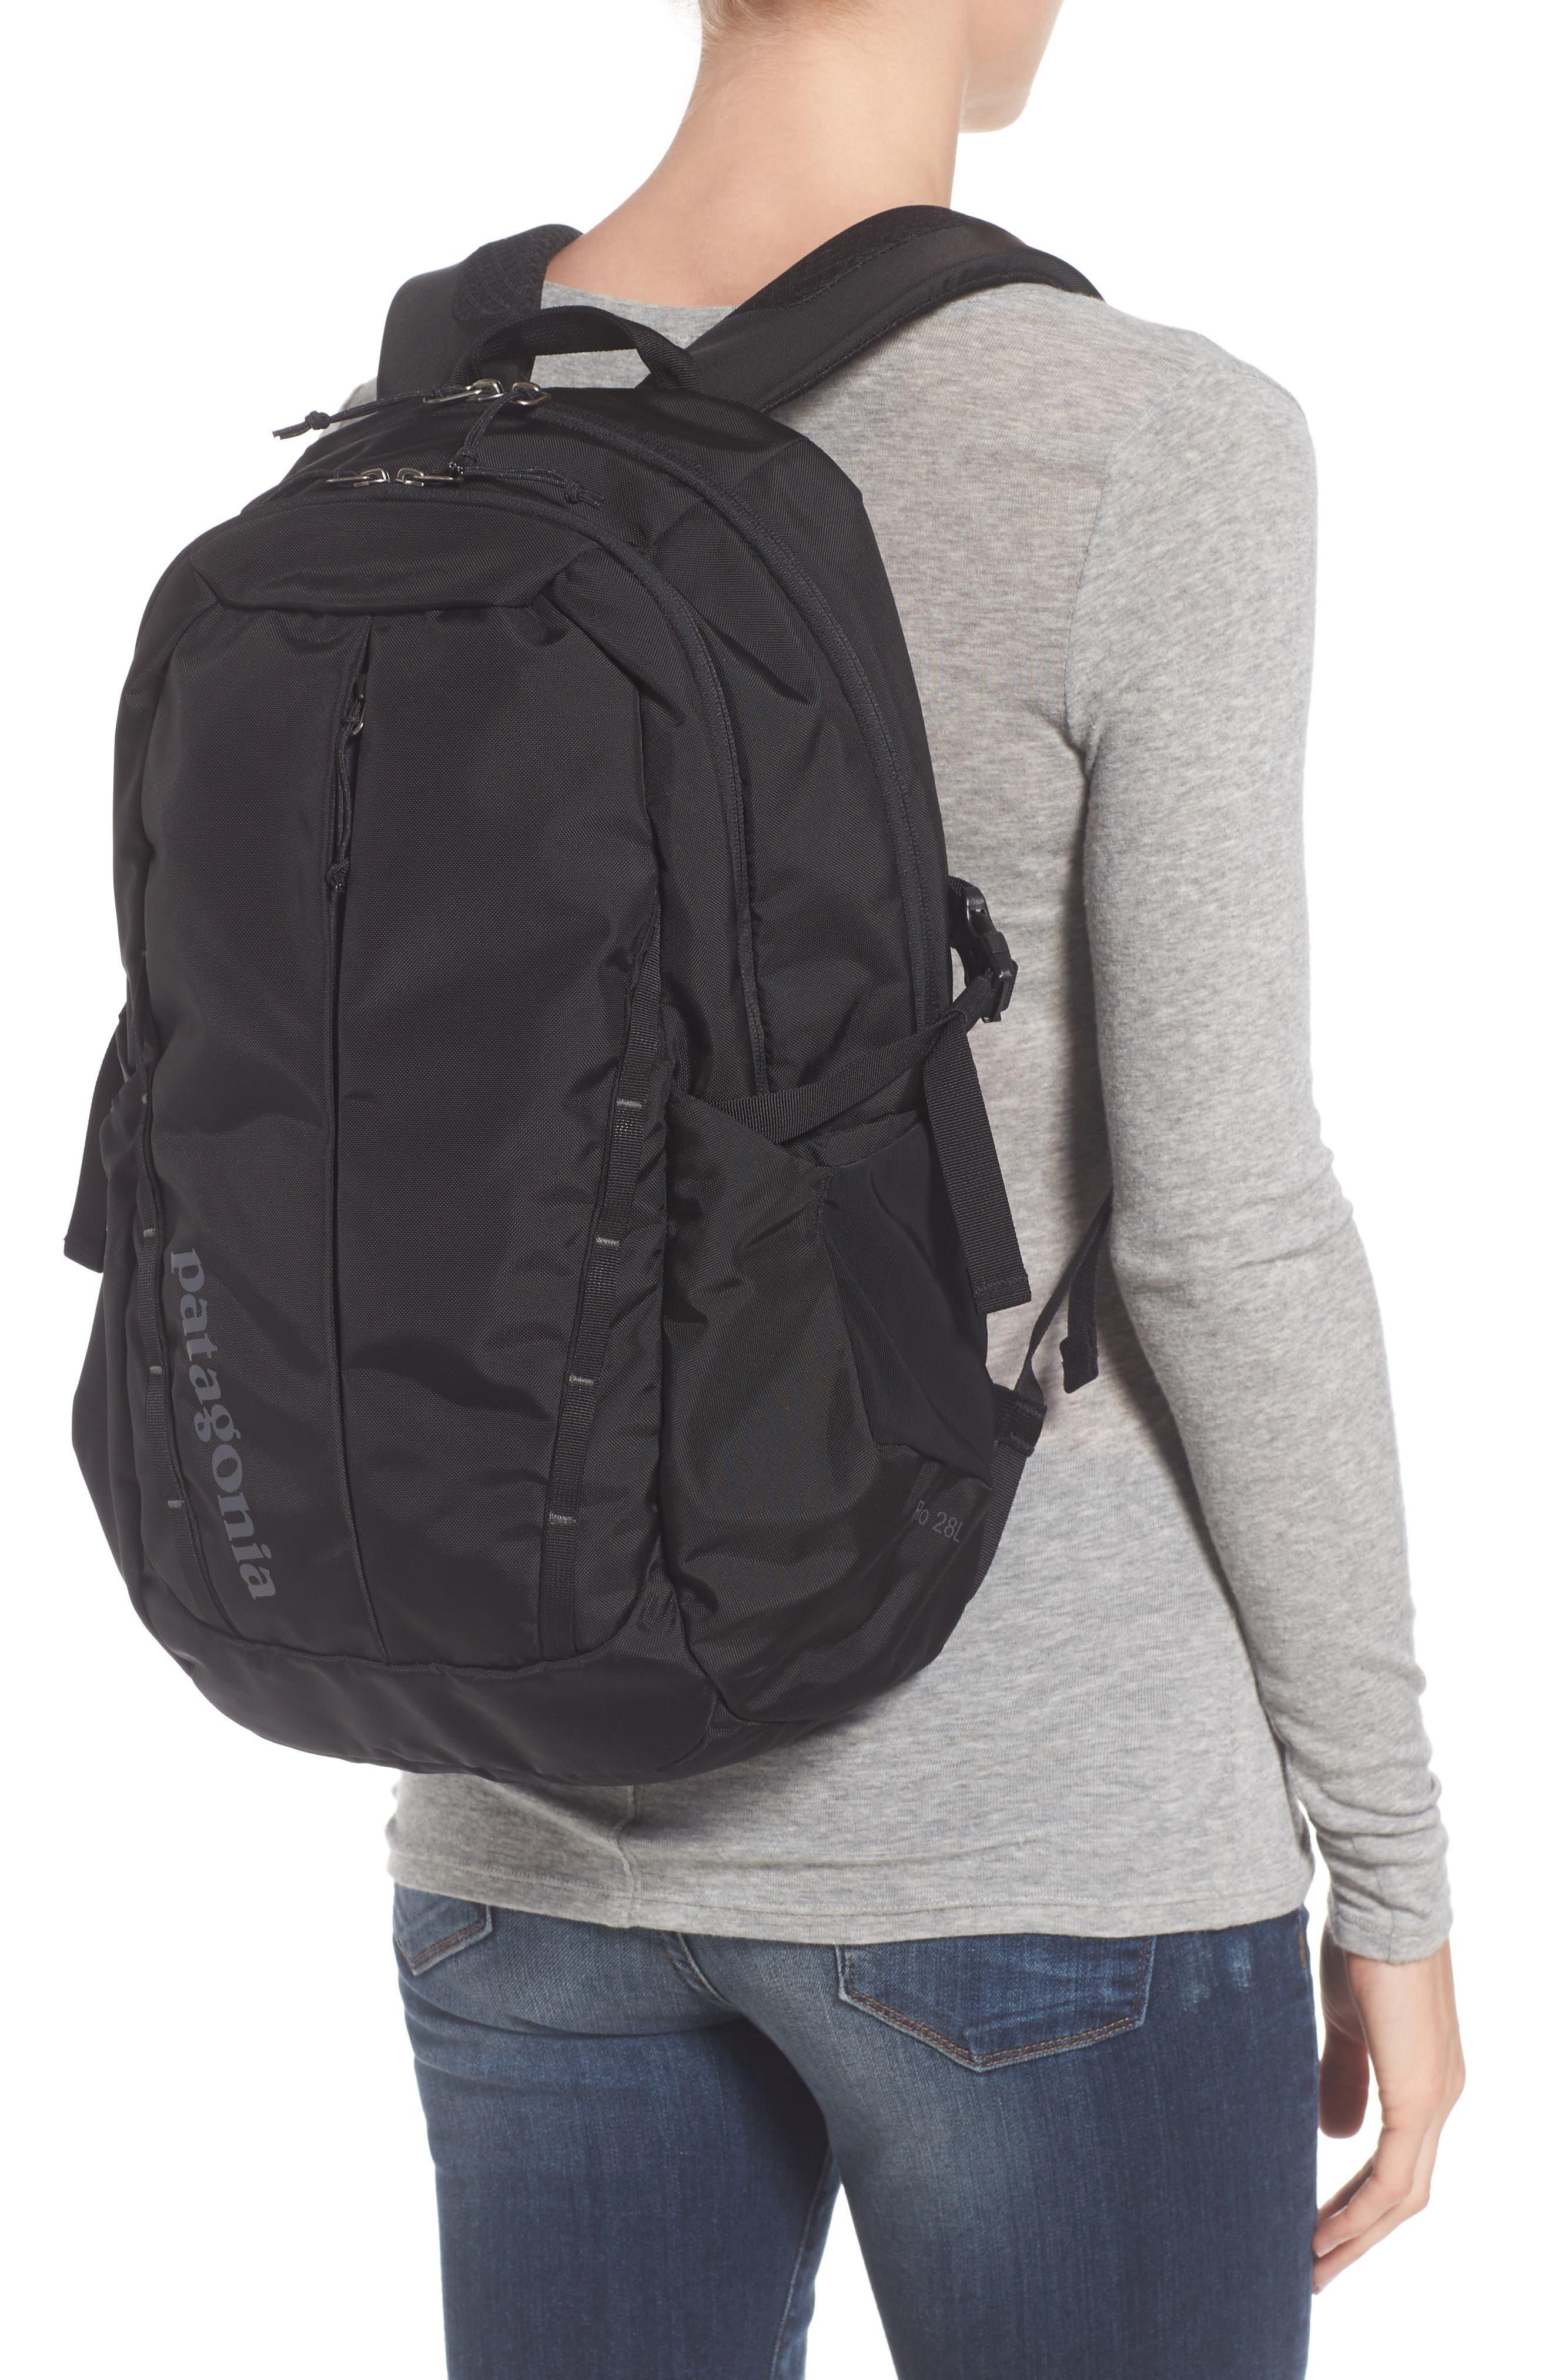 PATAGONIA, Refugio 26L Backpack, Alternate thumbnail 2, color, BLACK